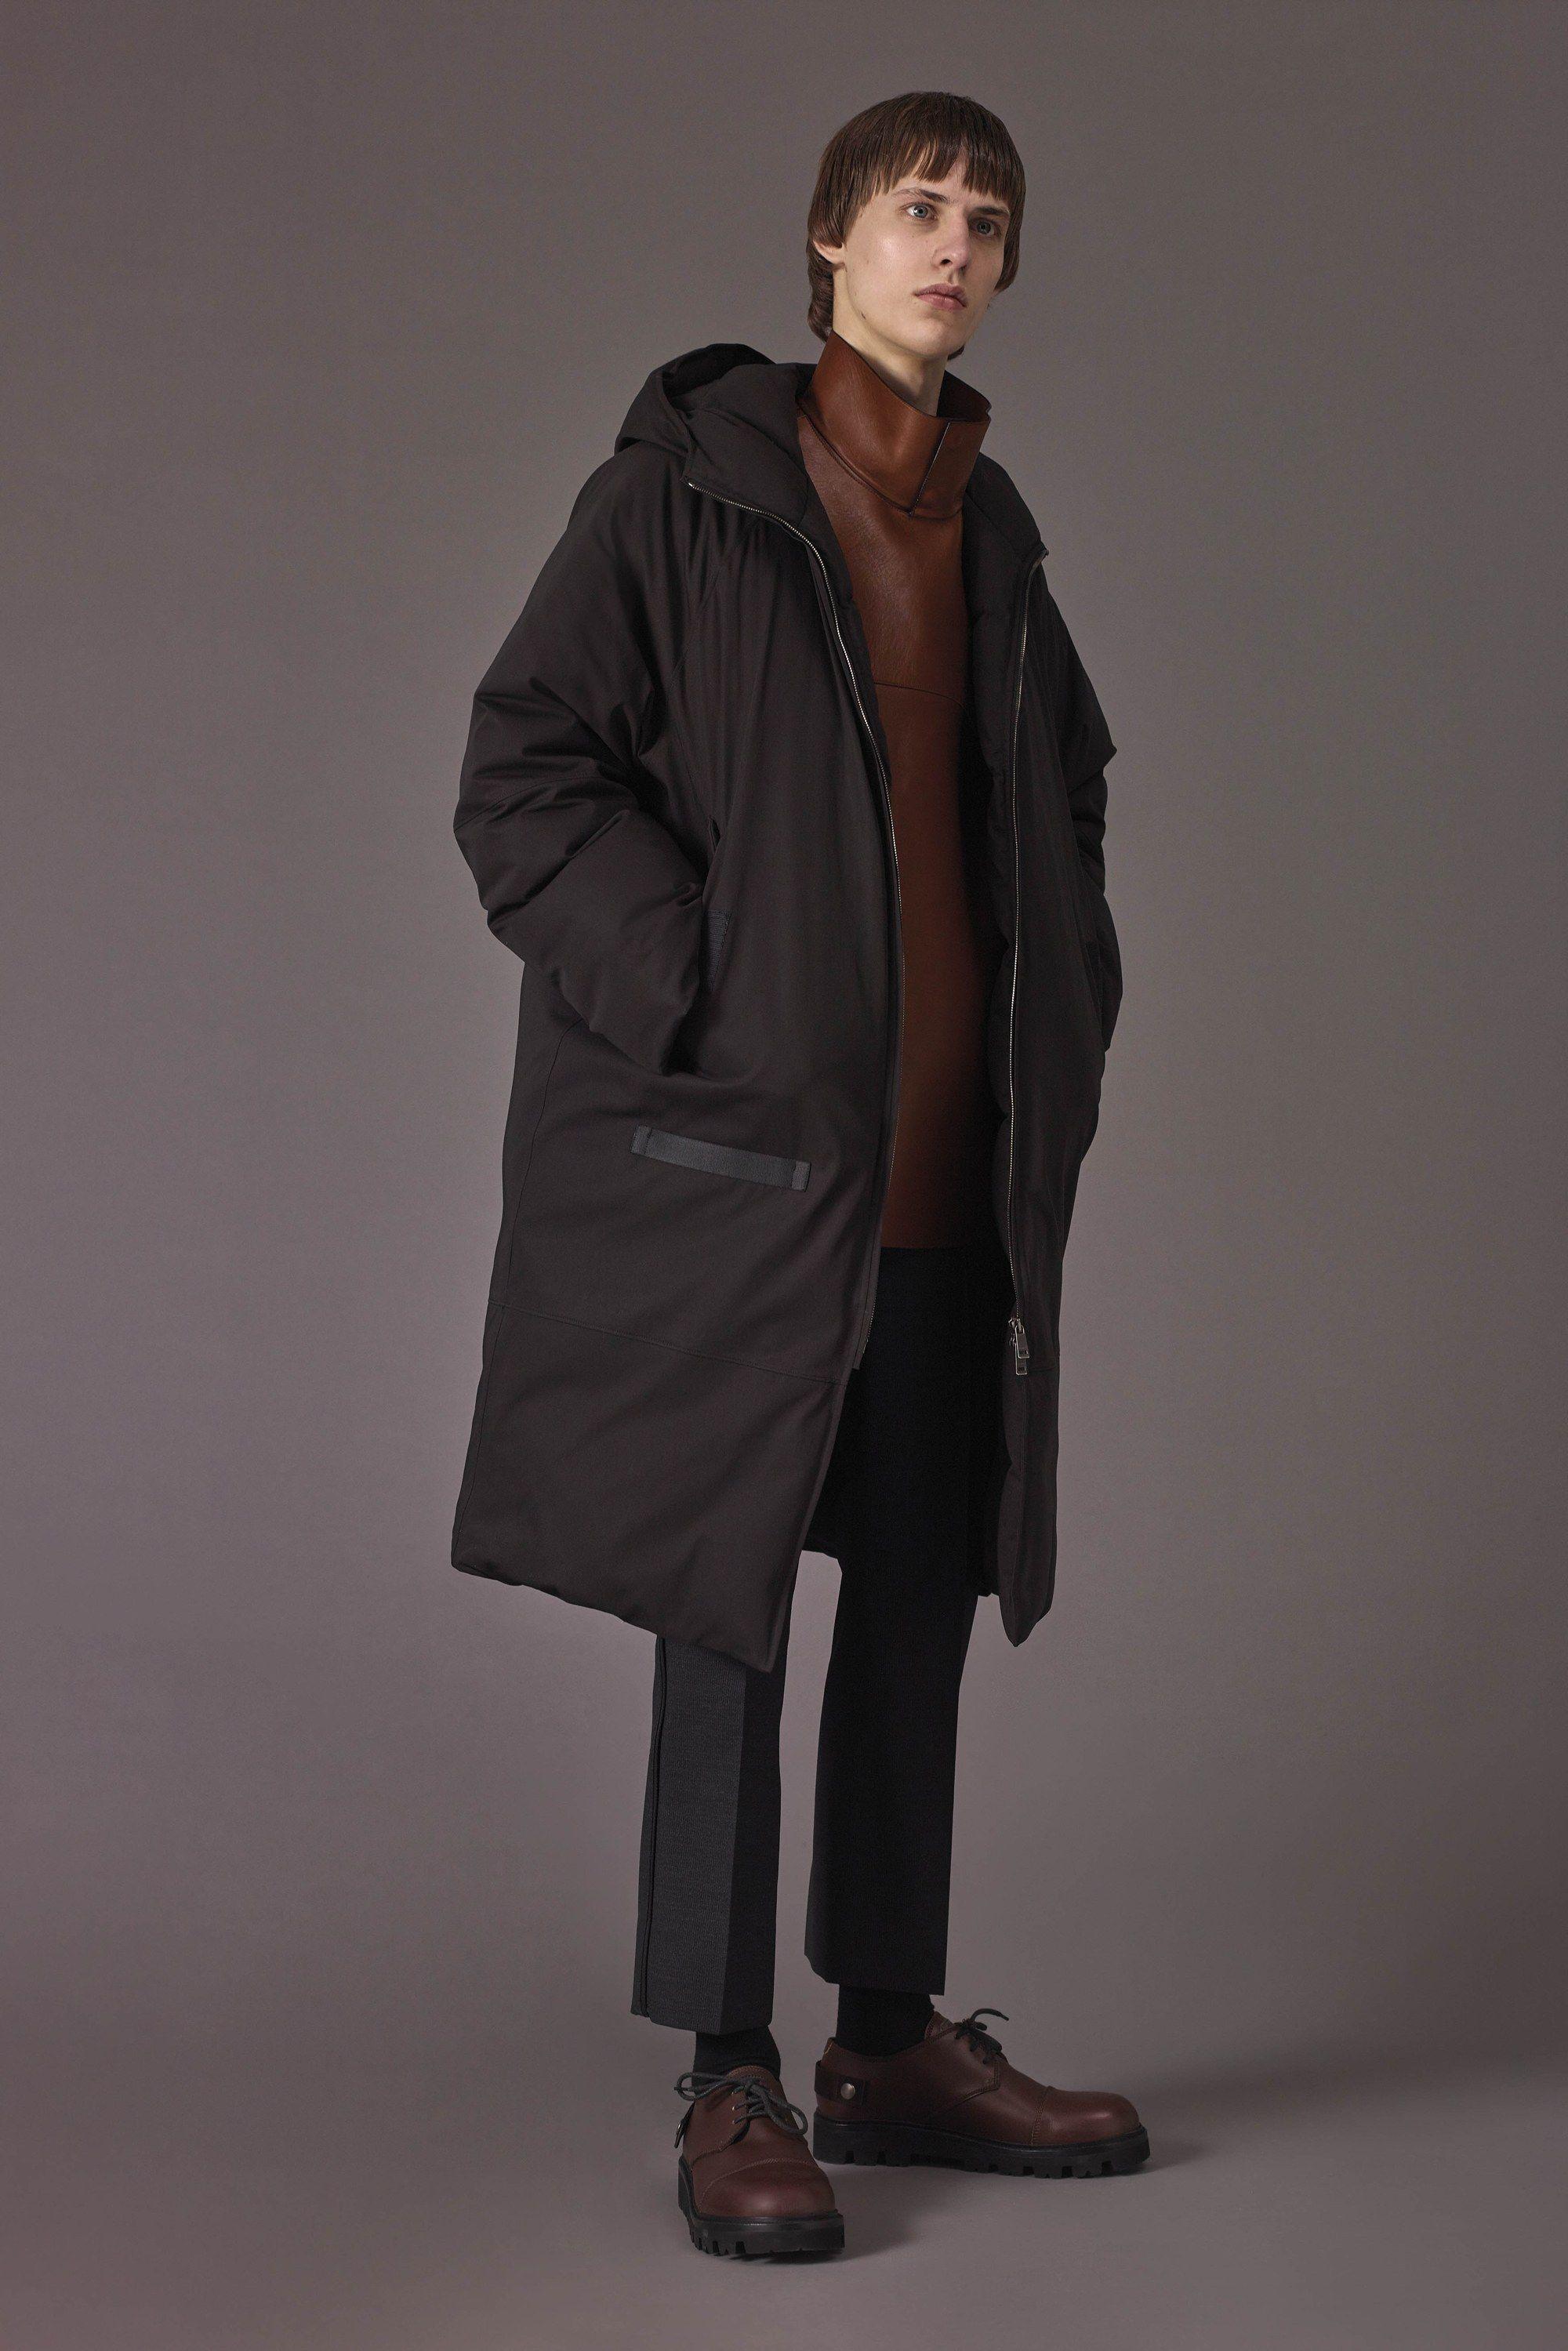 adb82898abb2 Jil Sander Fall 2017 Menswear Collection Photos - Vogue